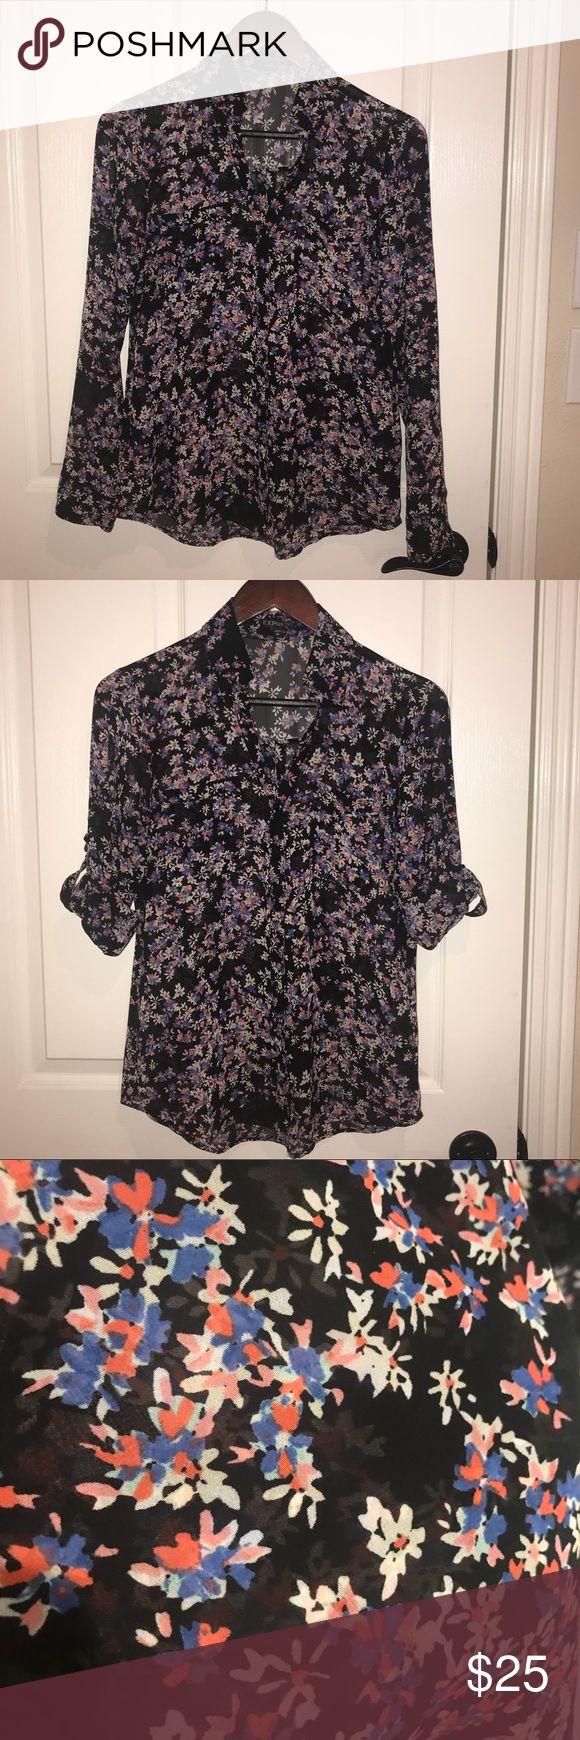 Blouse Beautiful all over flower print button down portofino shirt. Express Tops…